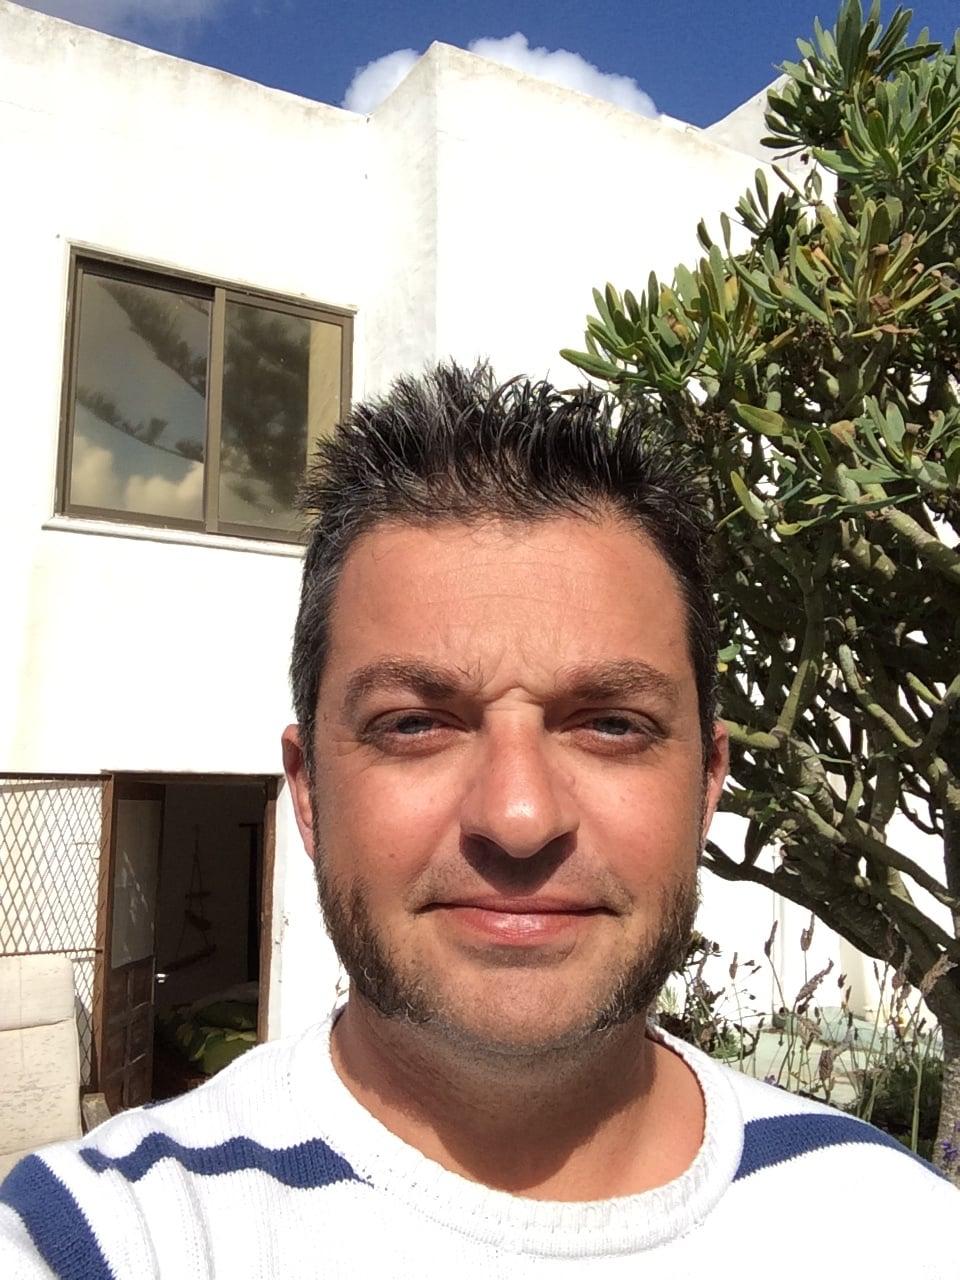 Giorgio from Costa Teguise